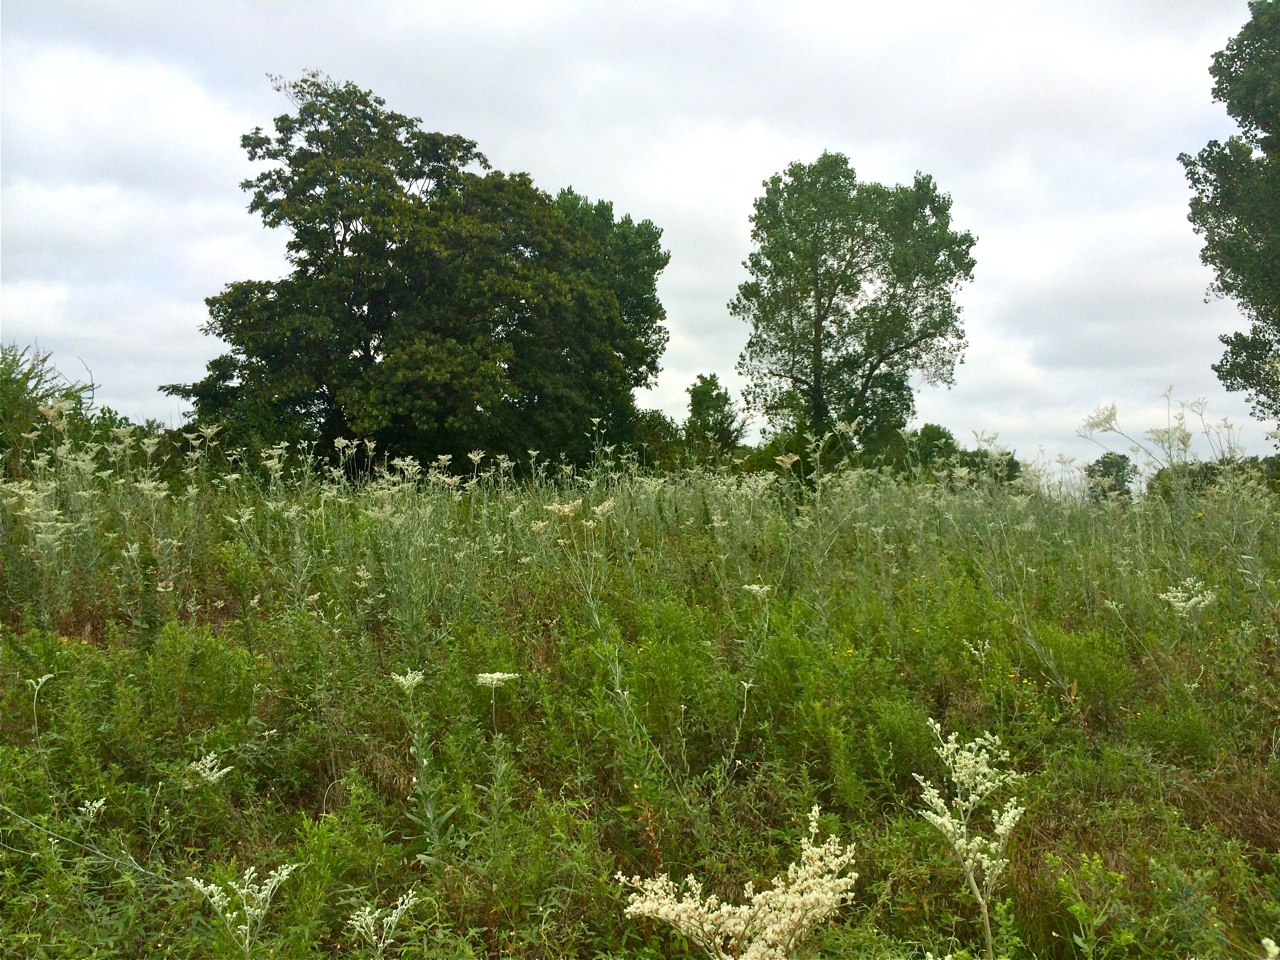 oklahoma native plants | Eco Landscaping